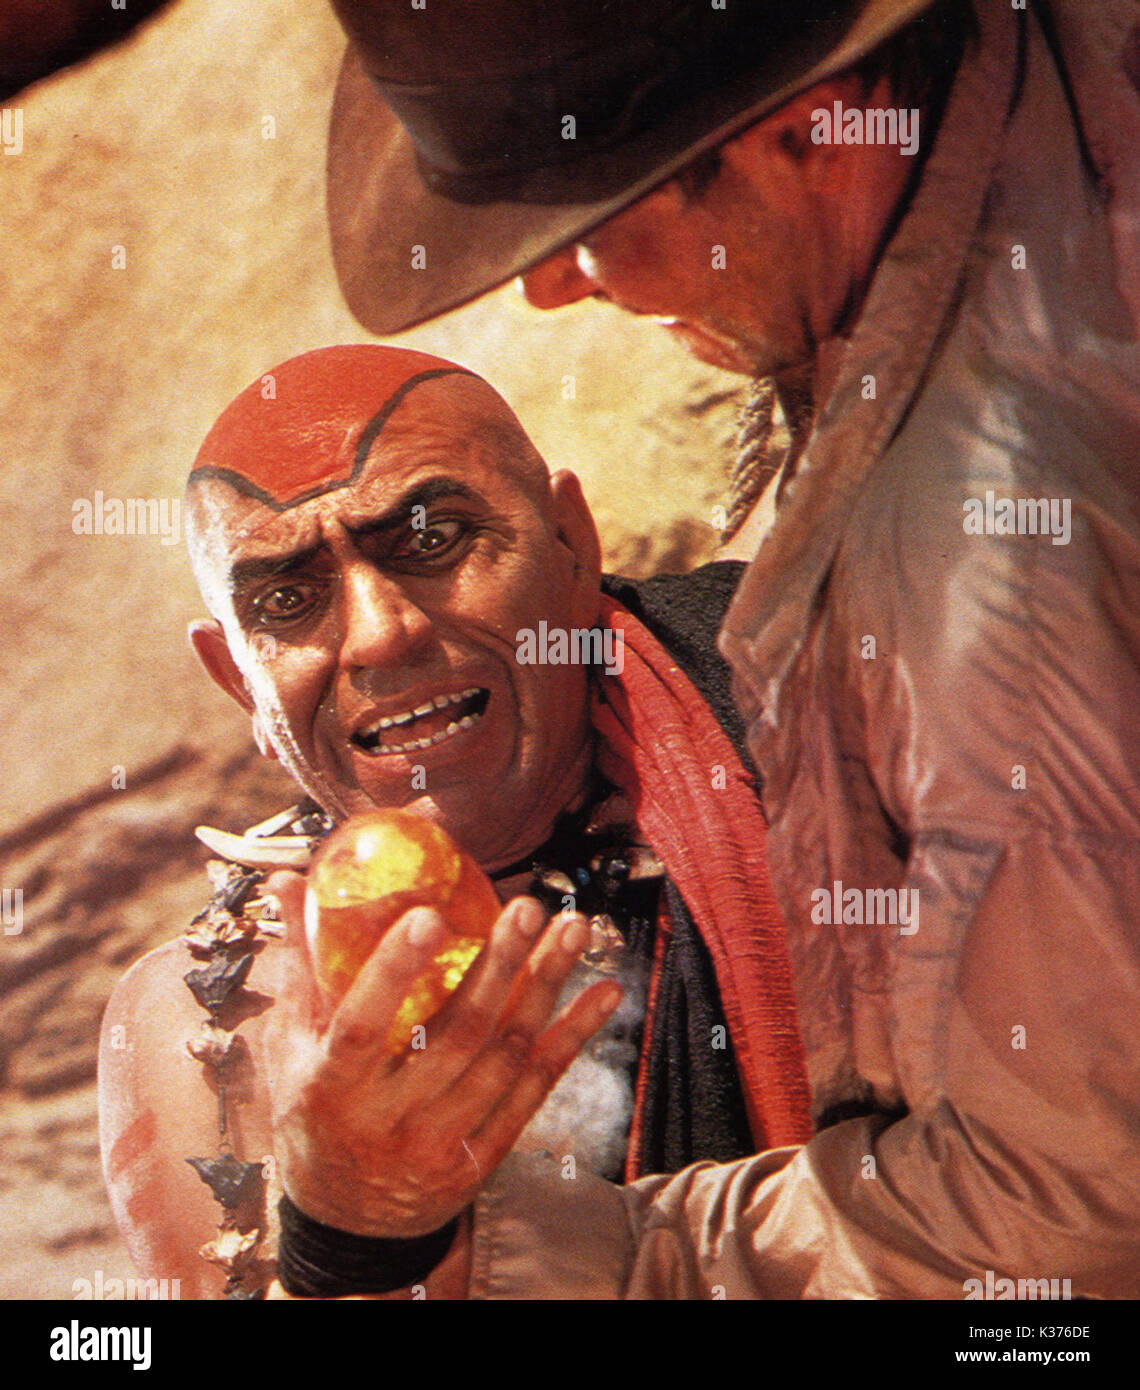 e0ea2d1c8 INDIANA JONES AND THE TEMPLE OF DOOM AMRISH PURI AS MOLA RAM A Stock ...